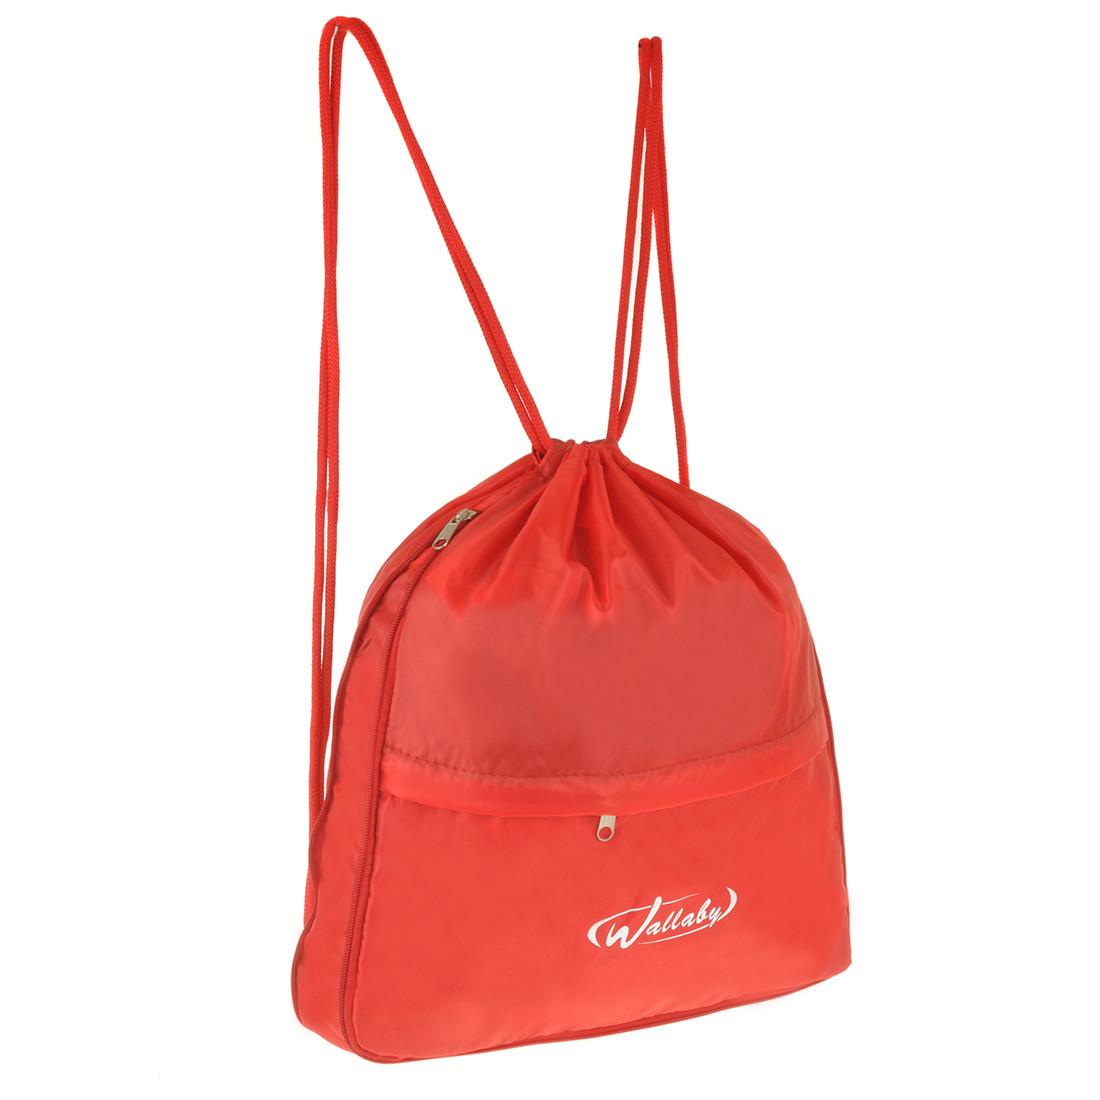 Рюкзак-котомка Wallaby красный 35х38х10  для обуви и сменки ткань нейлон  в 28272кр